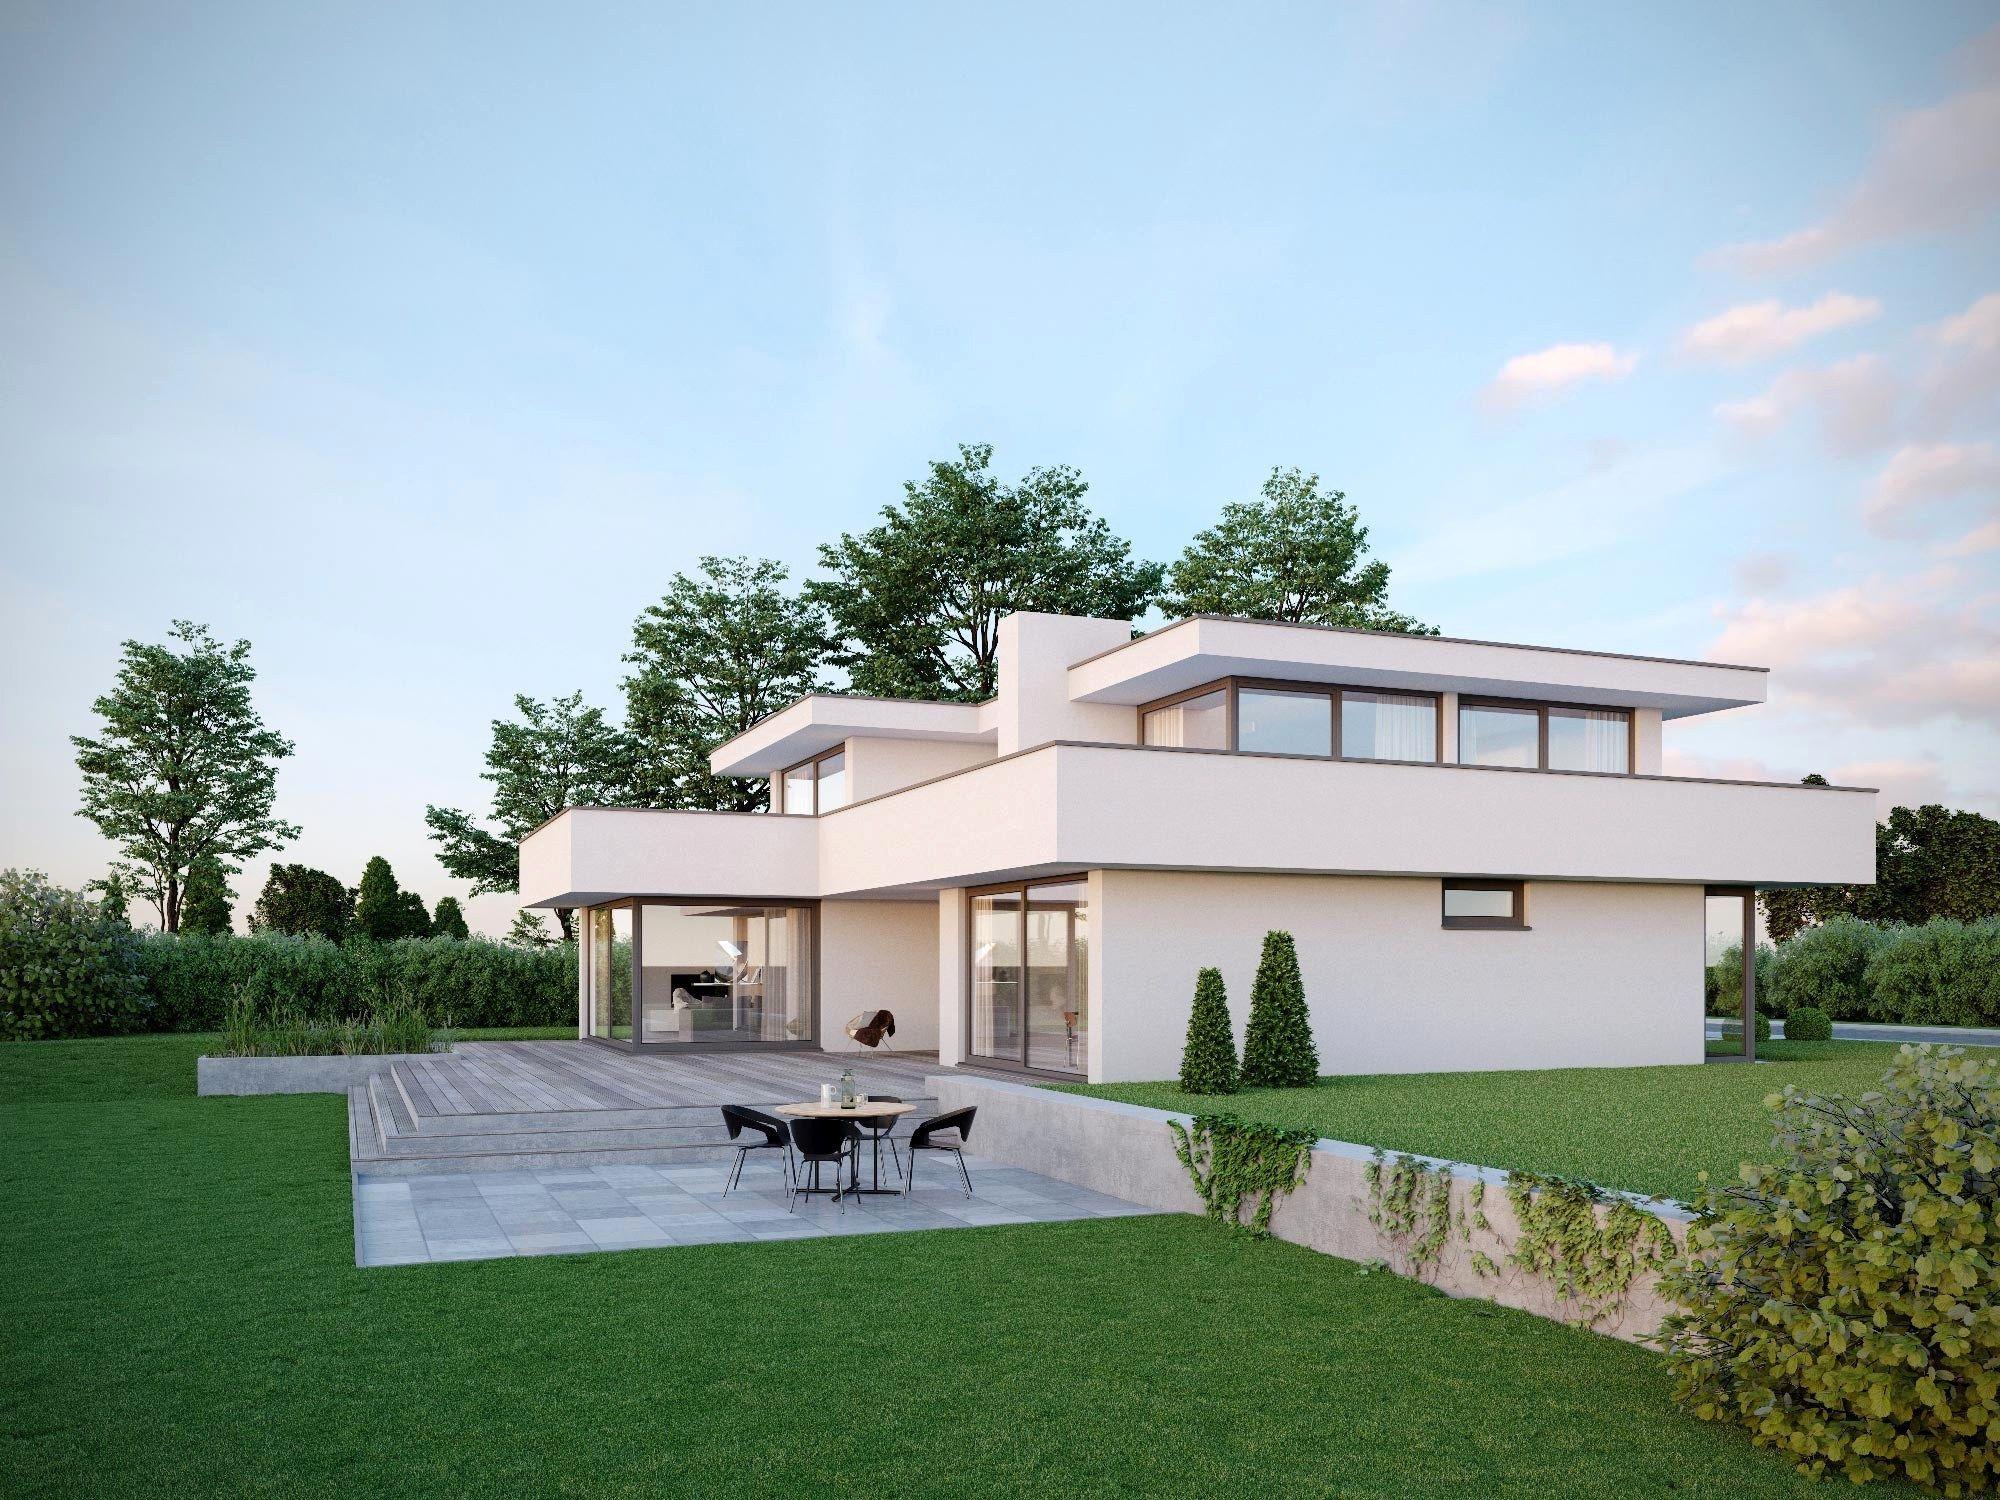 Moderne Haeuser Flachdach Detail Hauser Bauen Beim Haus